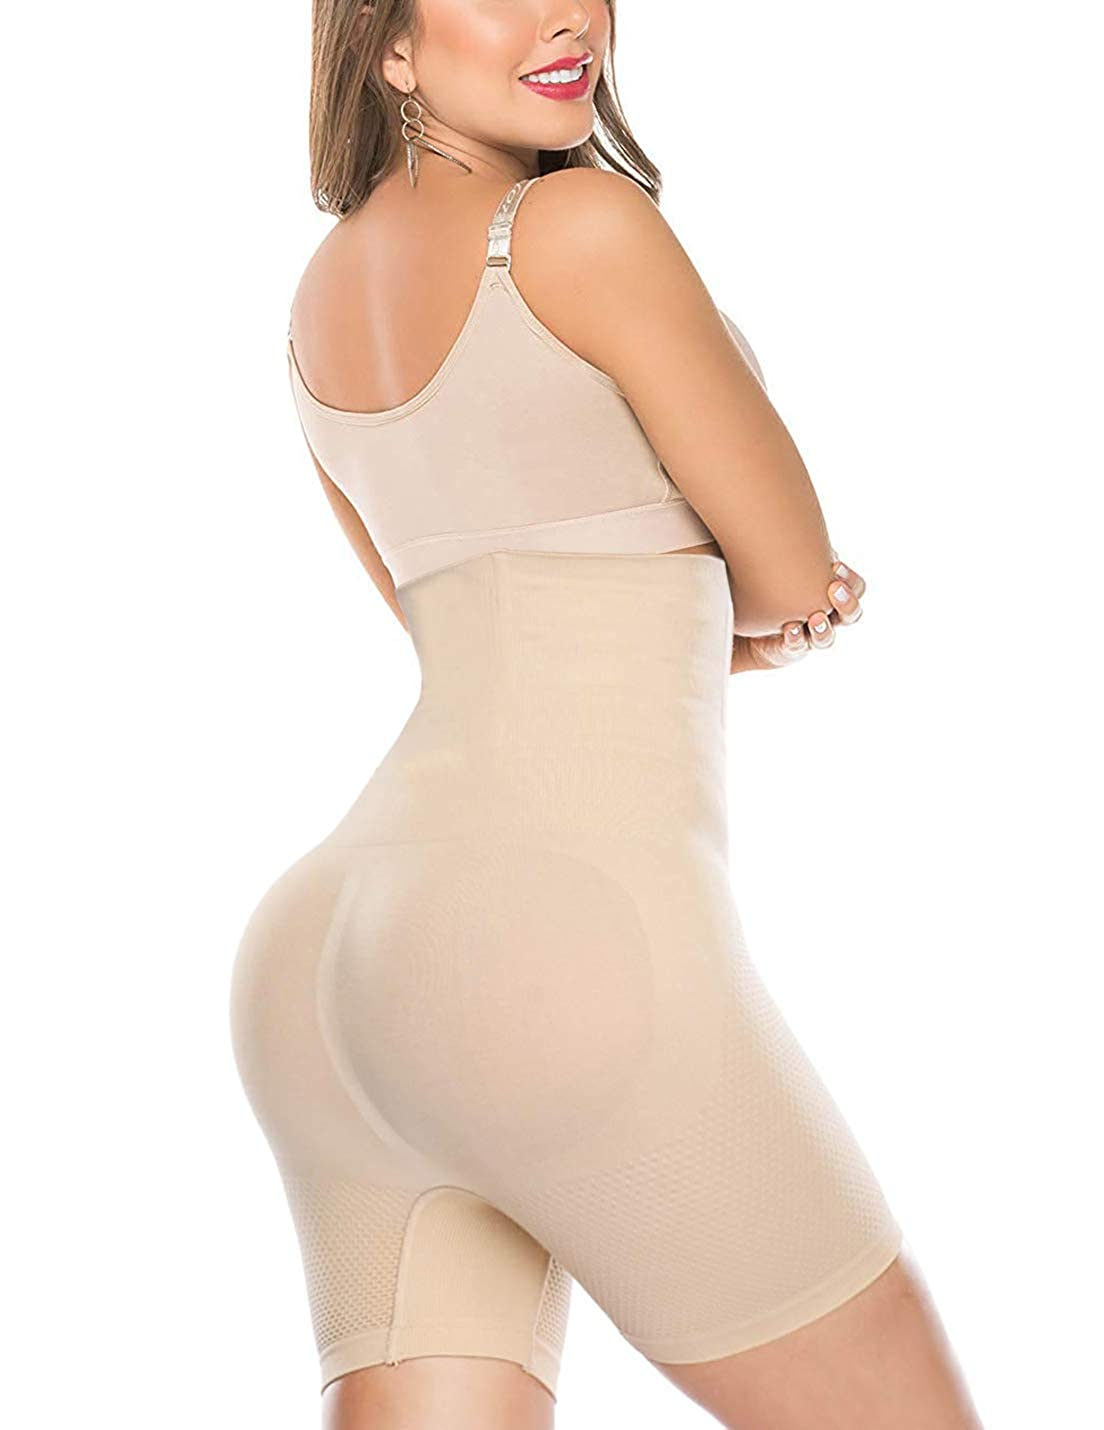 Beige Larry&Marry Women High Waist Cincher Girdle Belly Slimmer Trainer Black Shapewear Butt Lifter